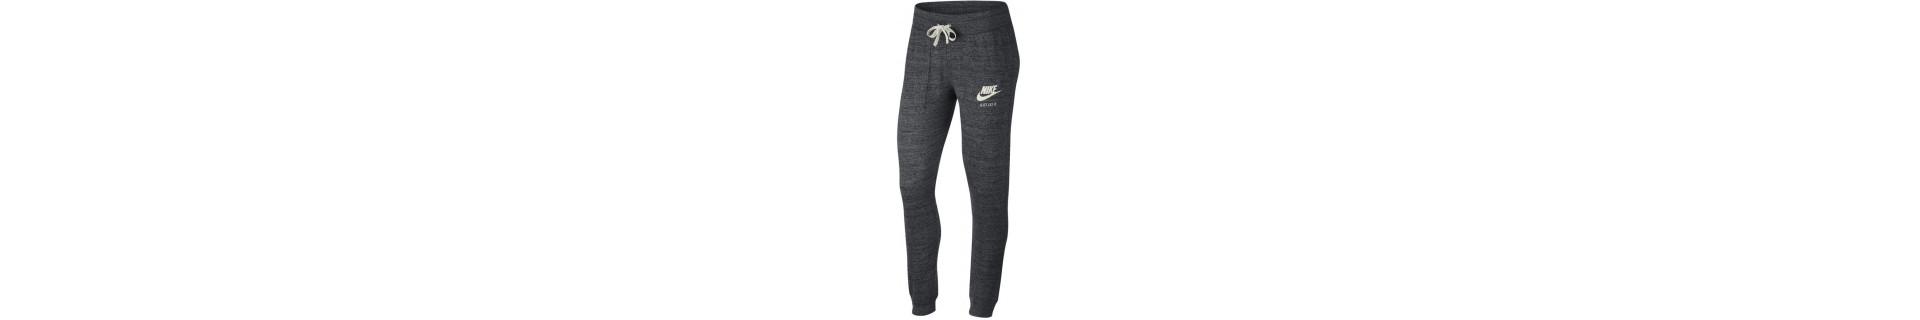 Pantalones, vaqueros y shorts para mujer, Adidas, Nike, Reebok, Franklin & Marshall